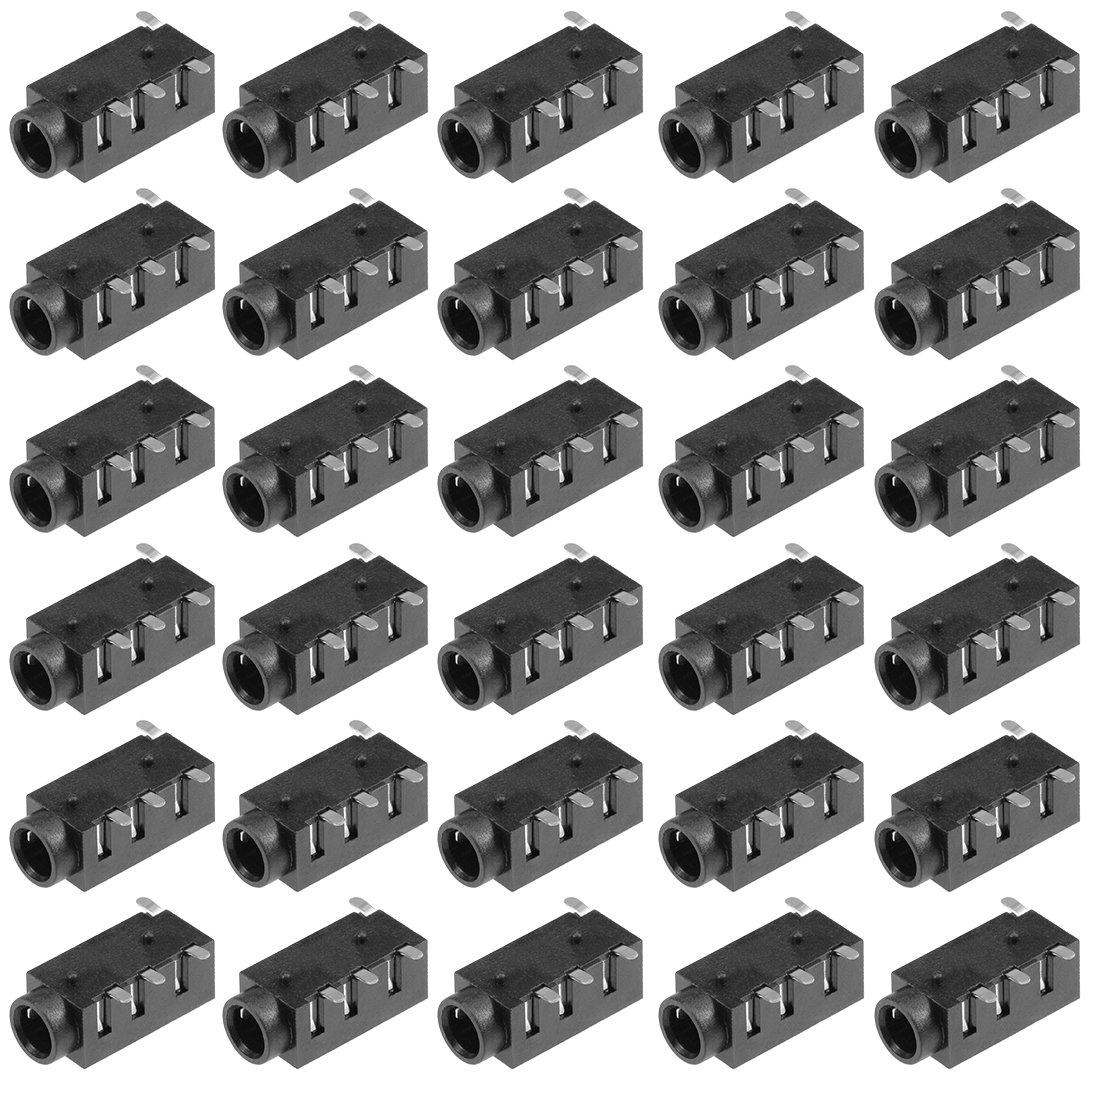 uxcell 30Pcs PCB Mount 3.5mm 4 Pin Socket Headphone Stereo Jack Audio Video Connector Black PJ320D